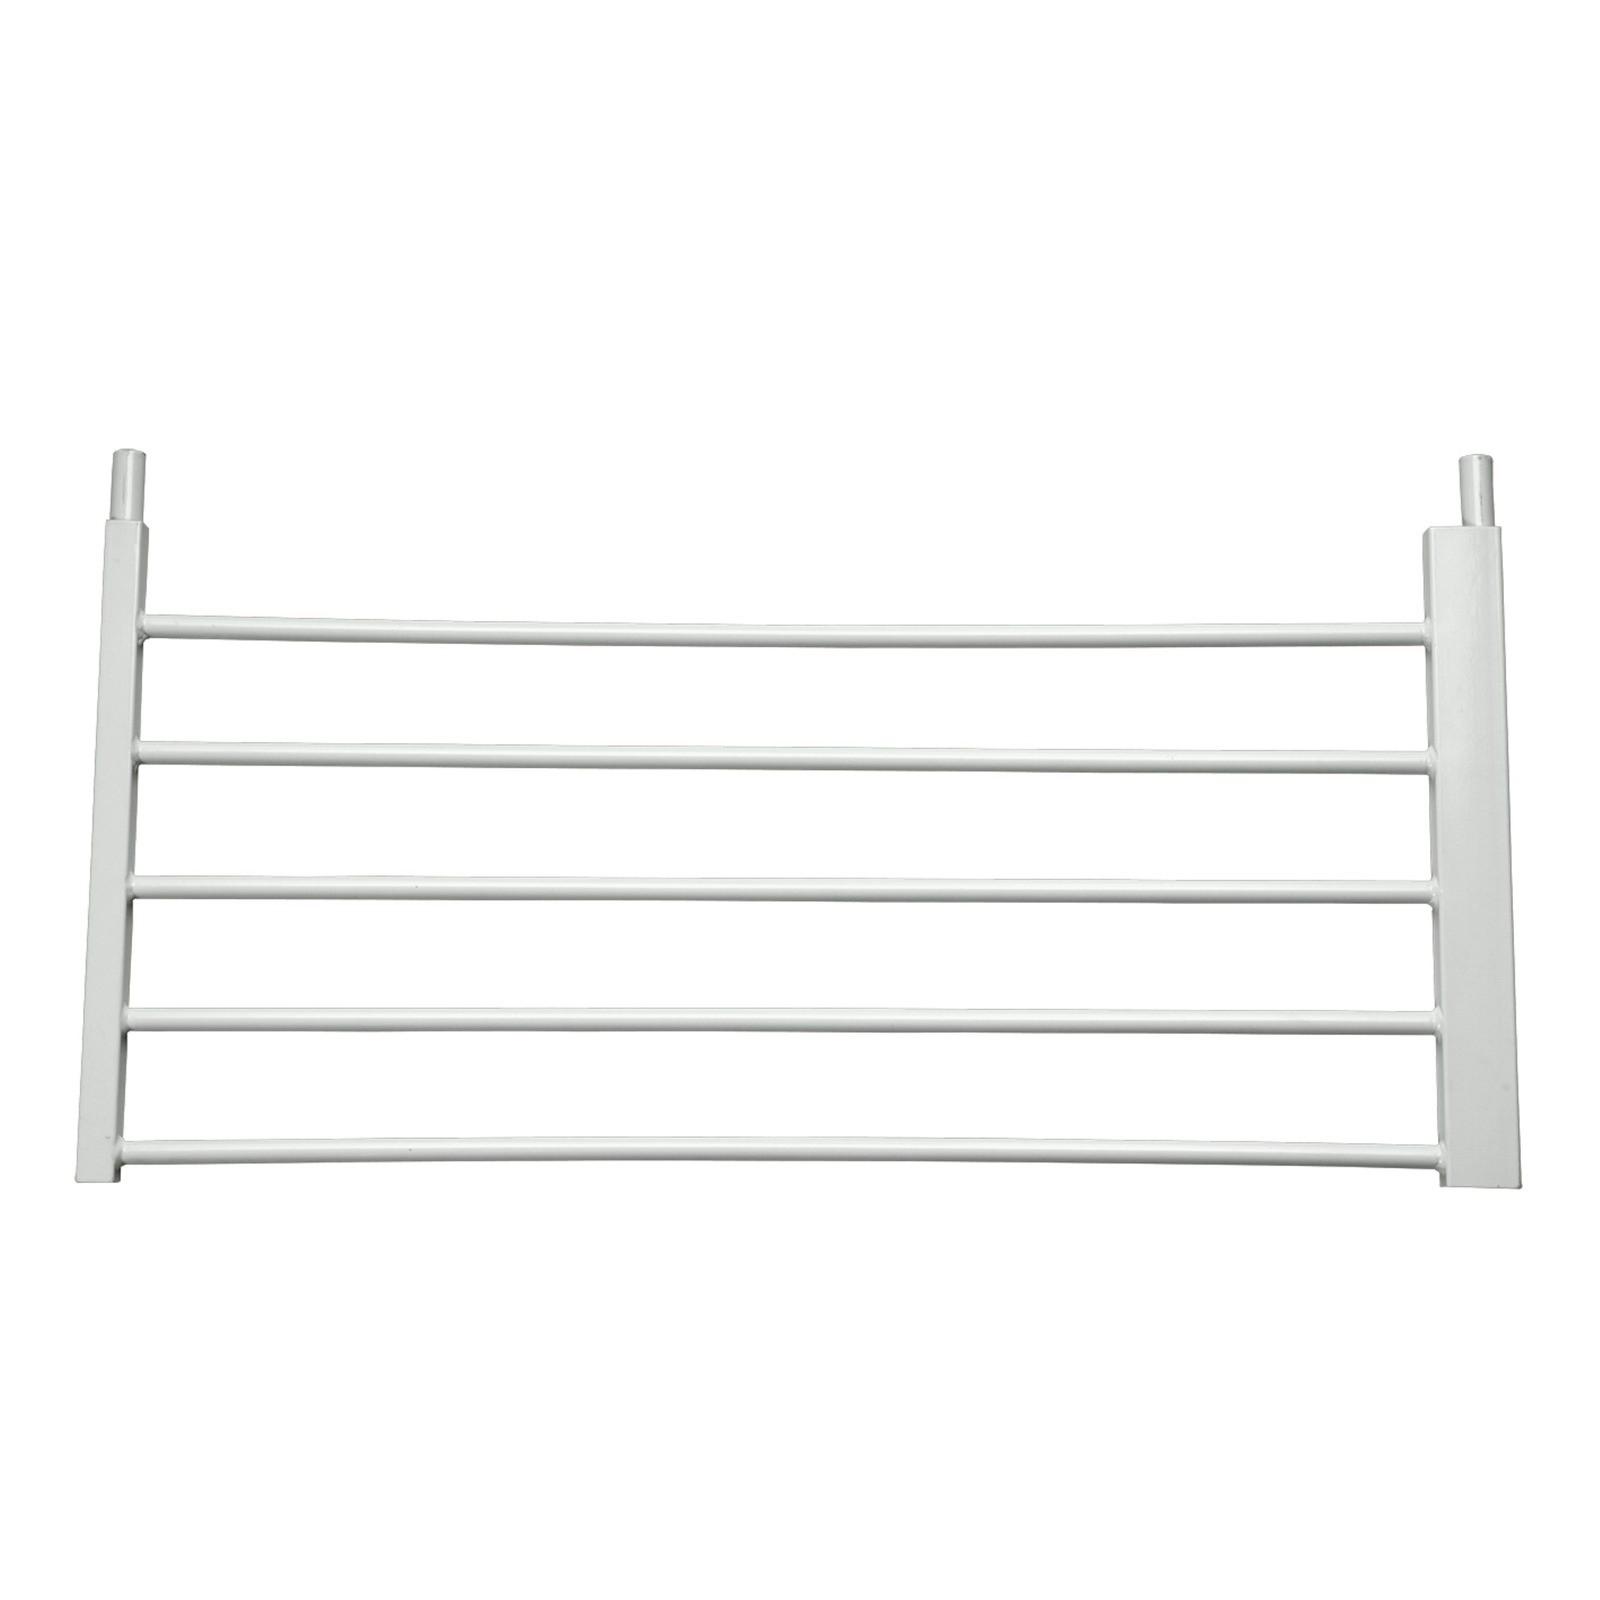 Chicco Extension Barrière de Protection - 360 mm